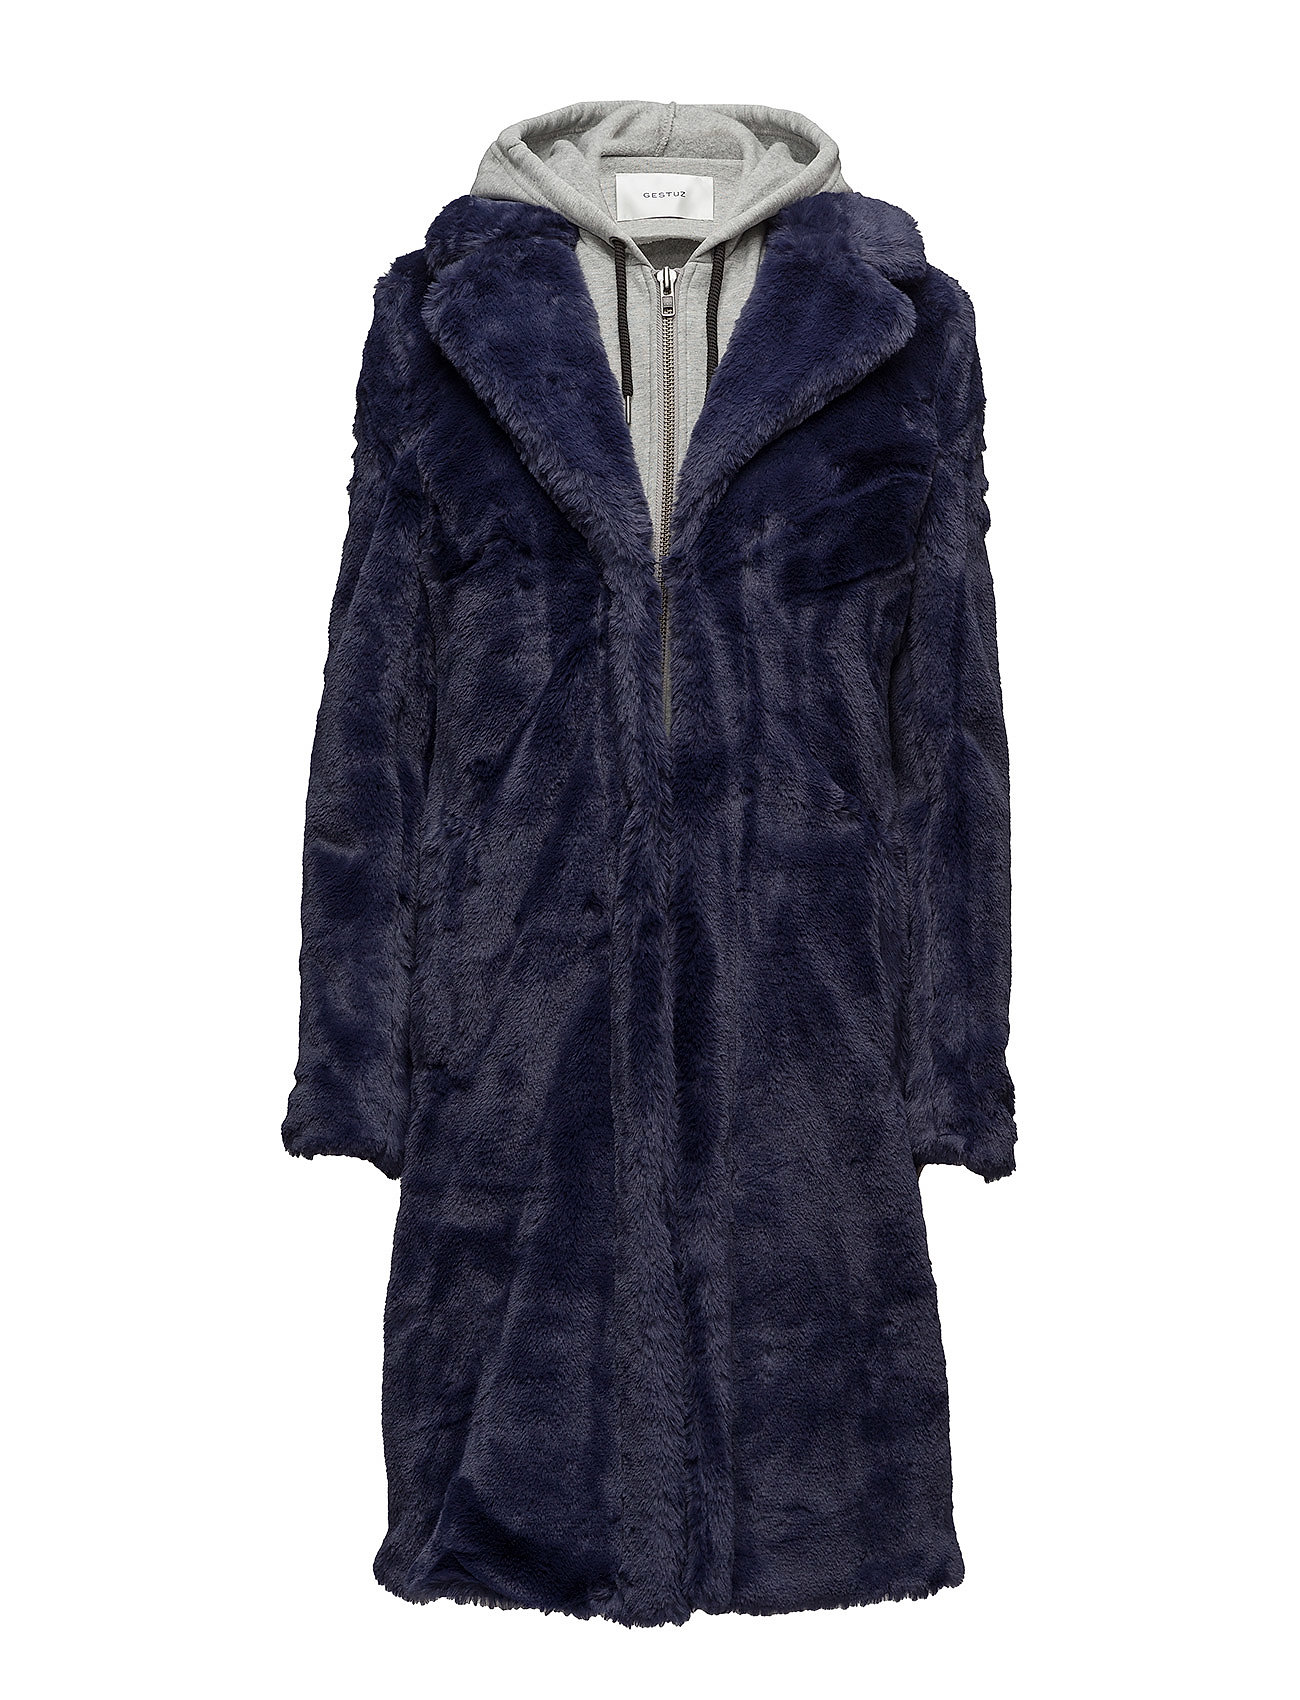 Gestuz Dehla coat MA17